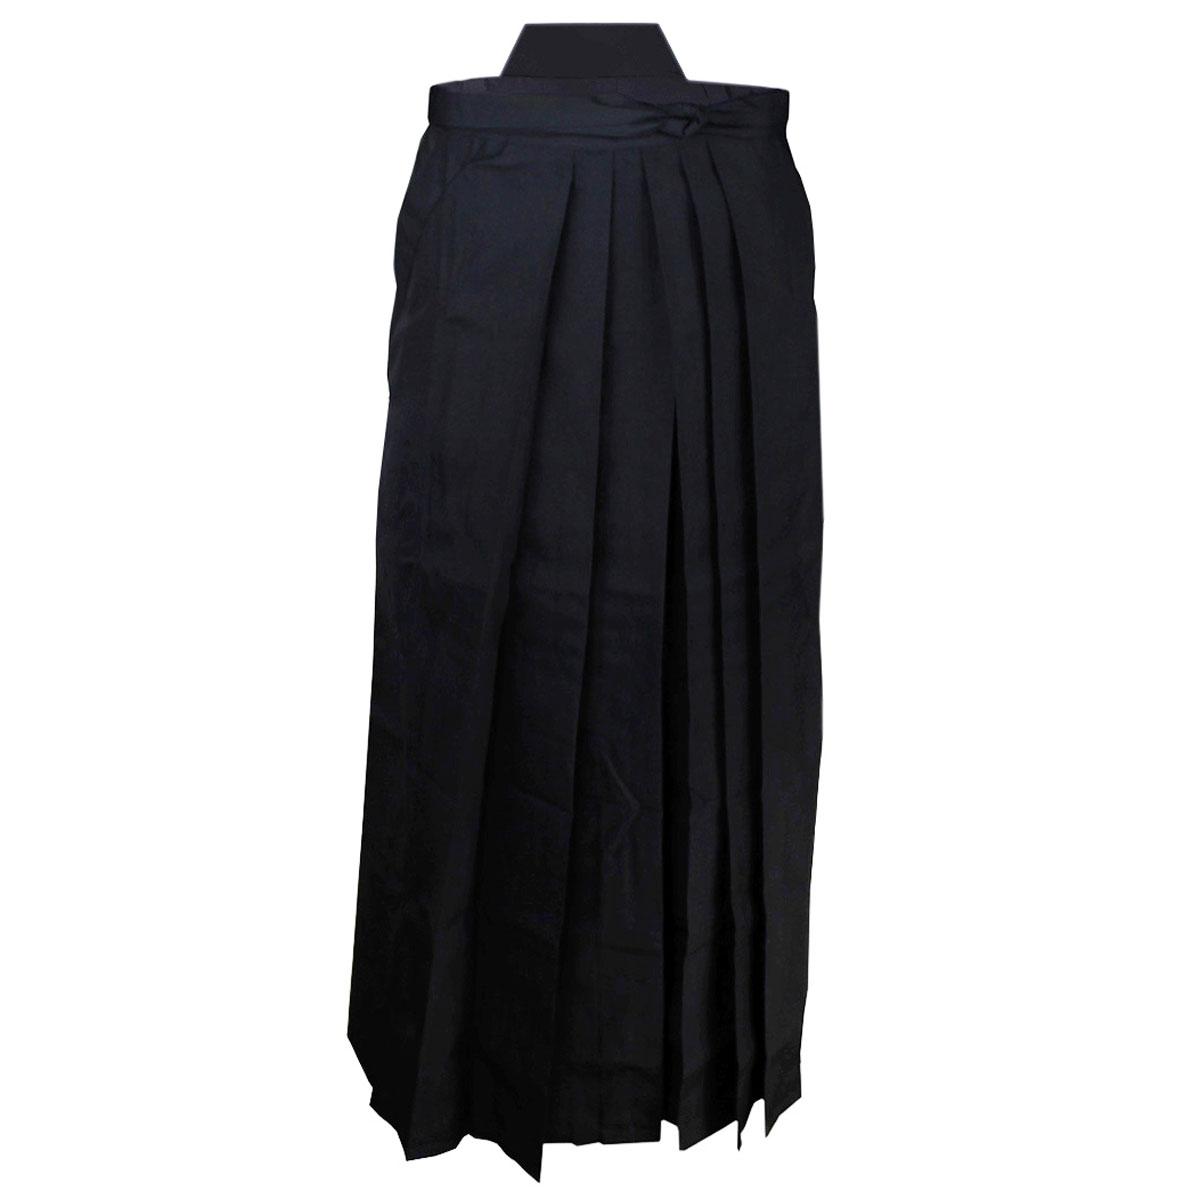 hakama schwarz verschiedene gr en aikido iaido kendo. Black Bedroom Furniture Sets. Home Design Ideas